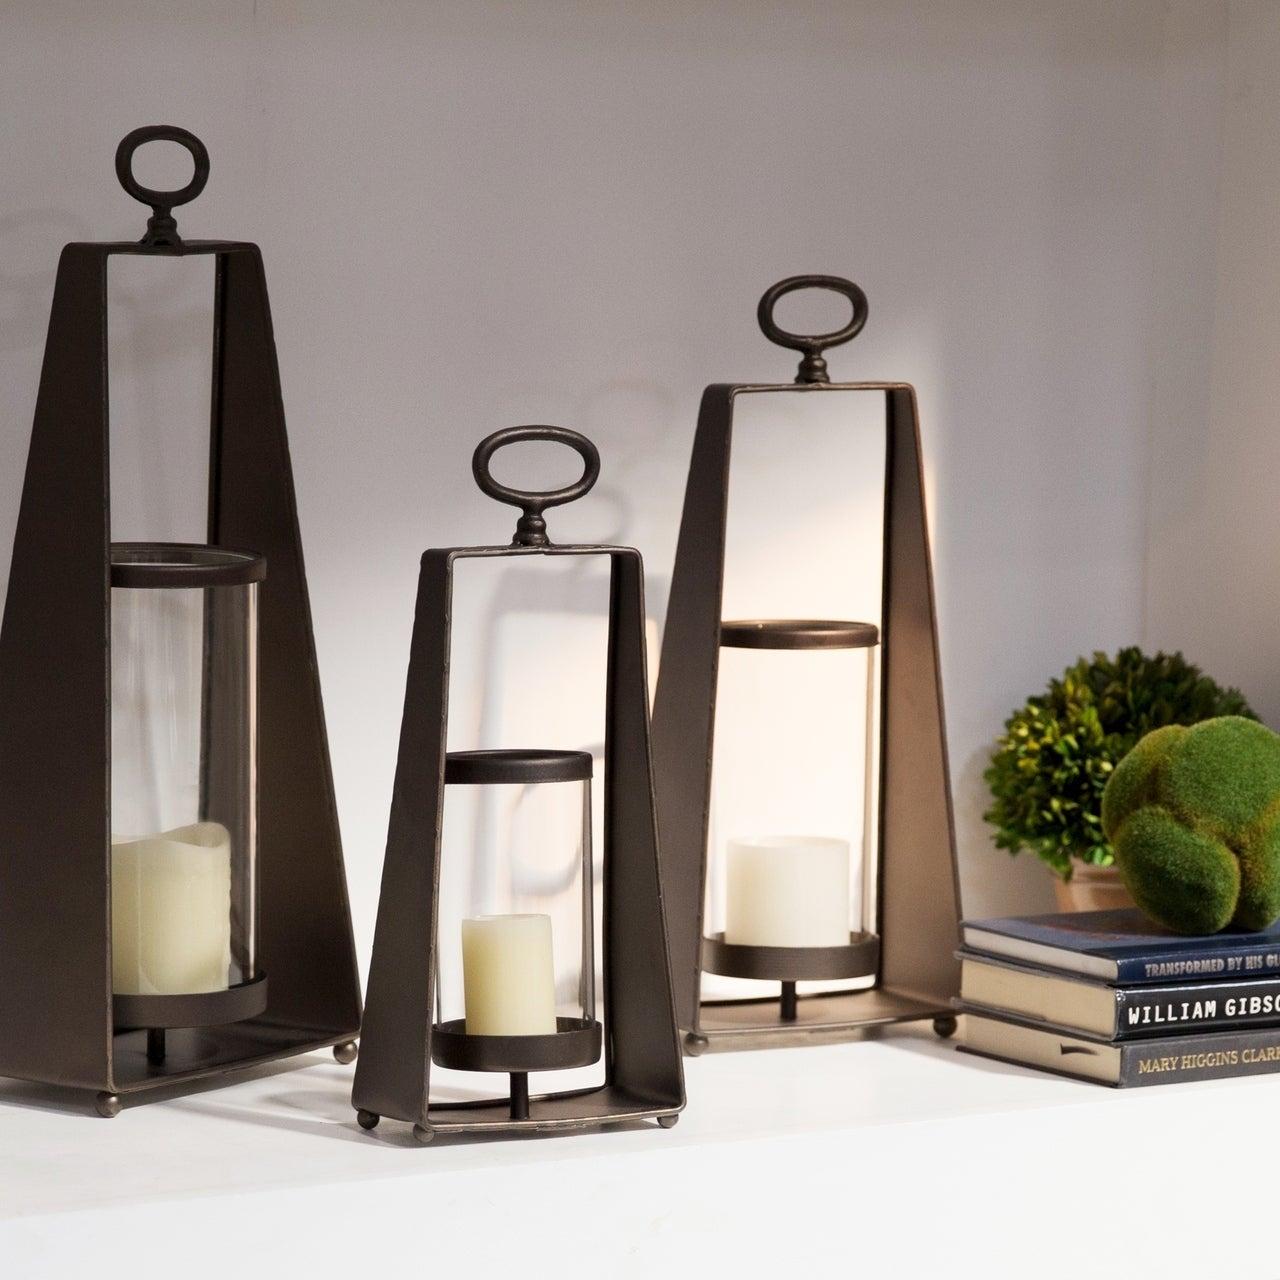 Utc38825 Metal Round Lantern With Oval Ring Handle And Glass Cylinder Holder Center Set Of Three Metallic Finish Dark Brown Overstock 19207577